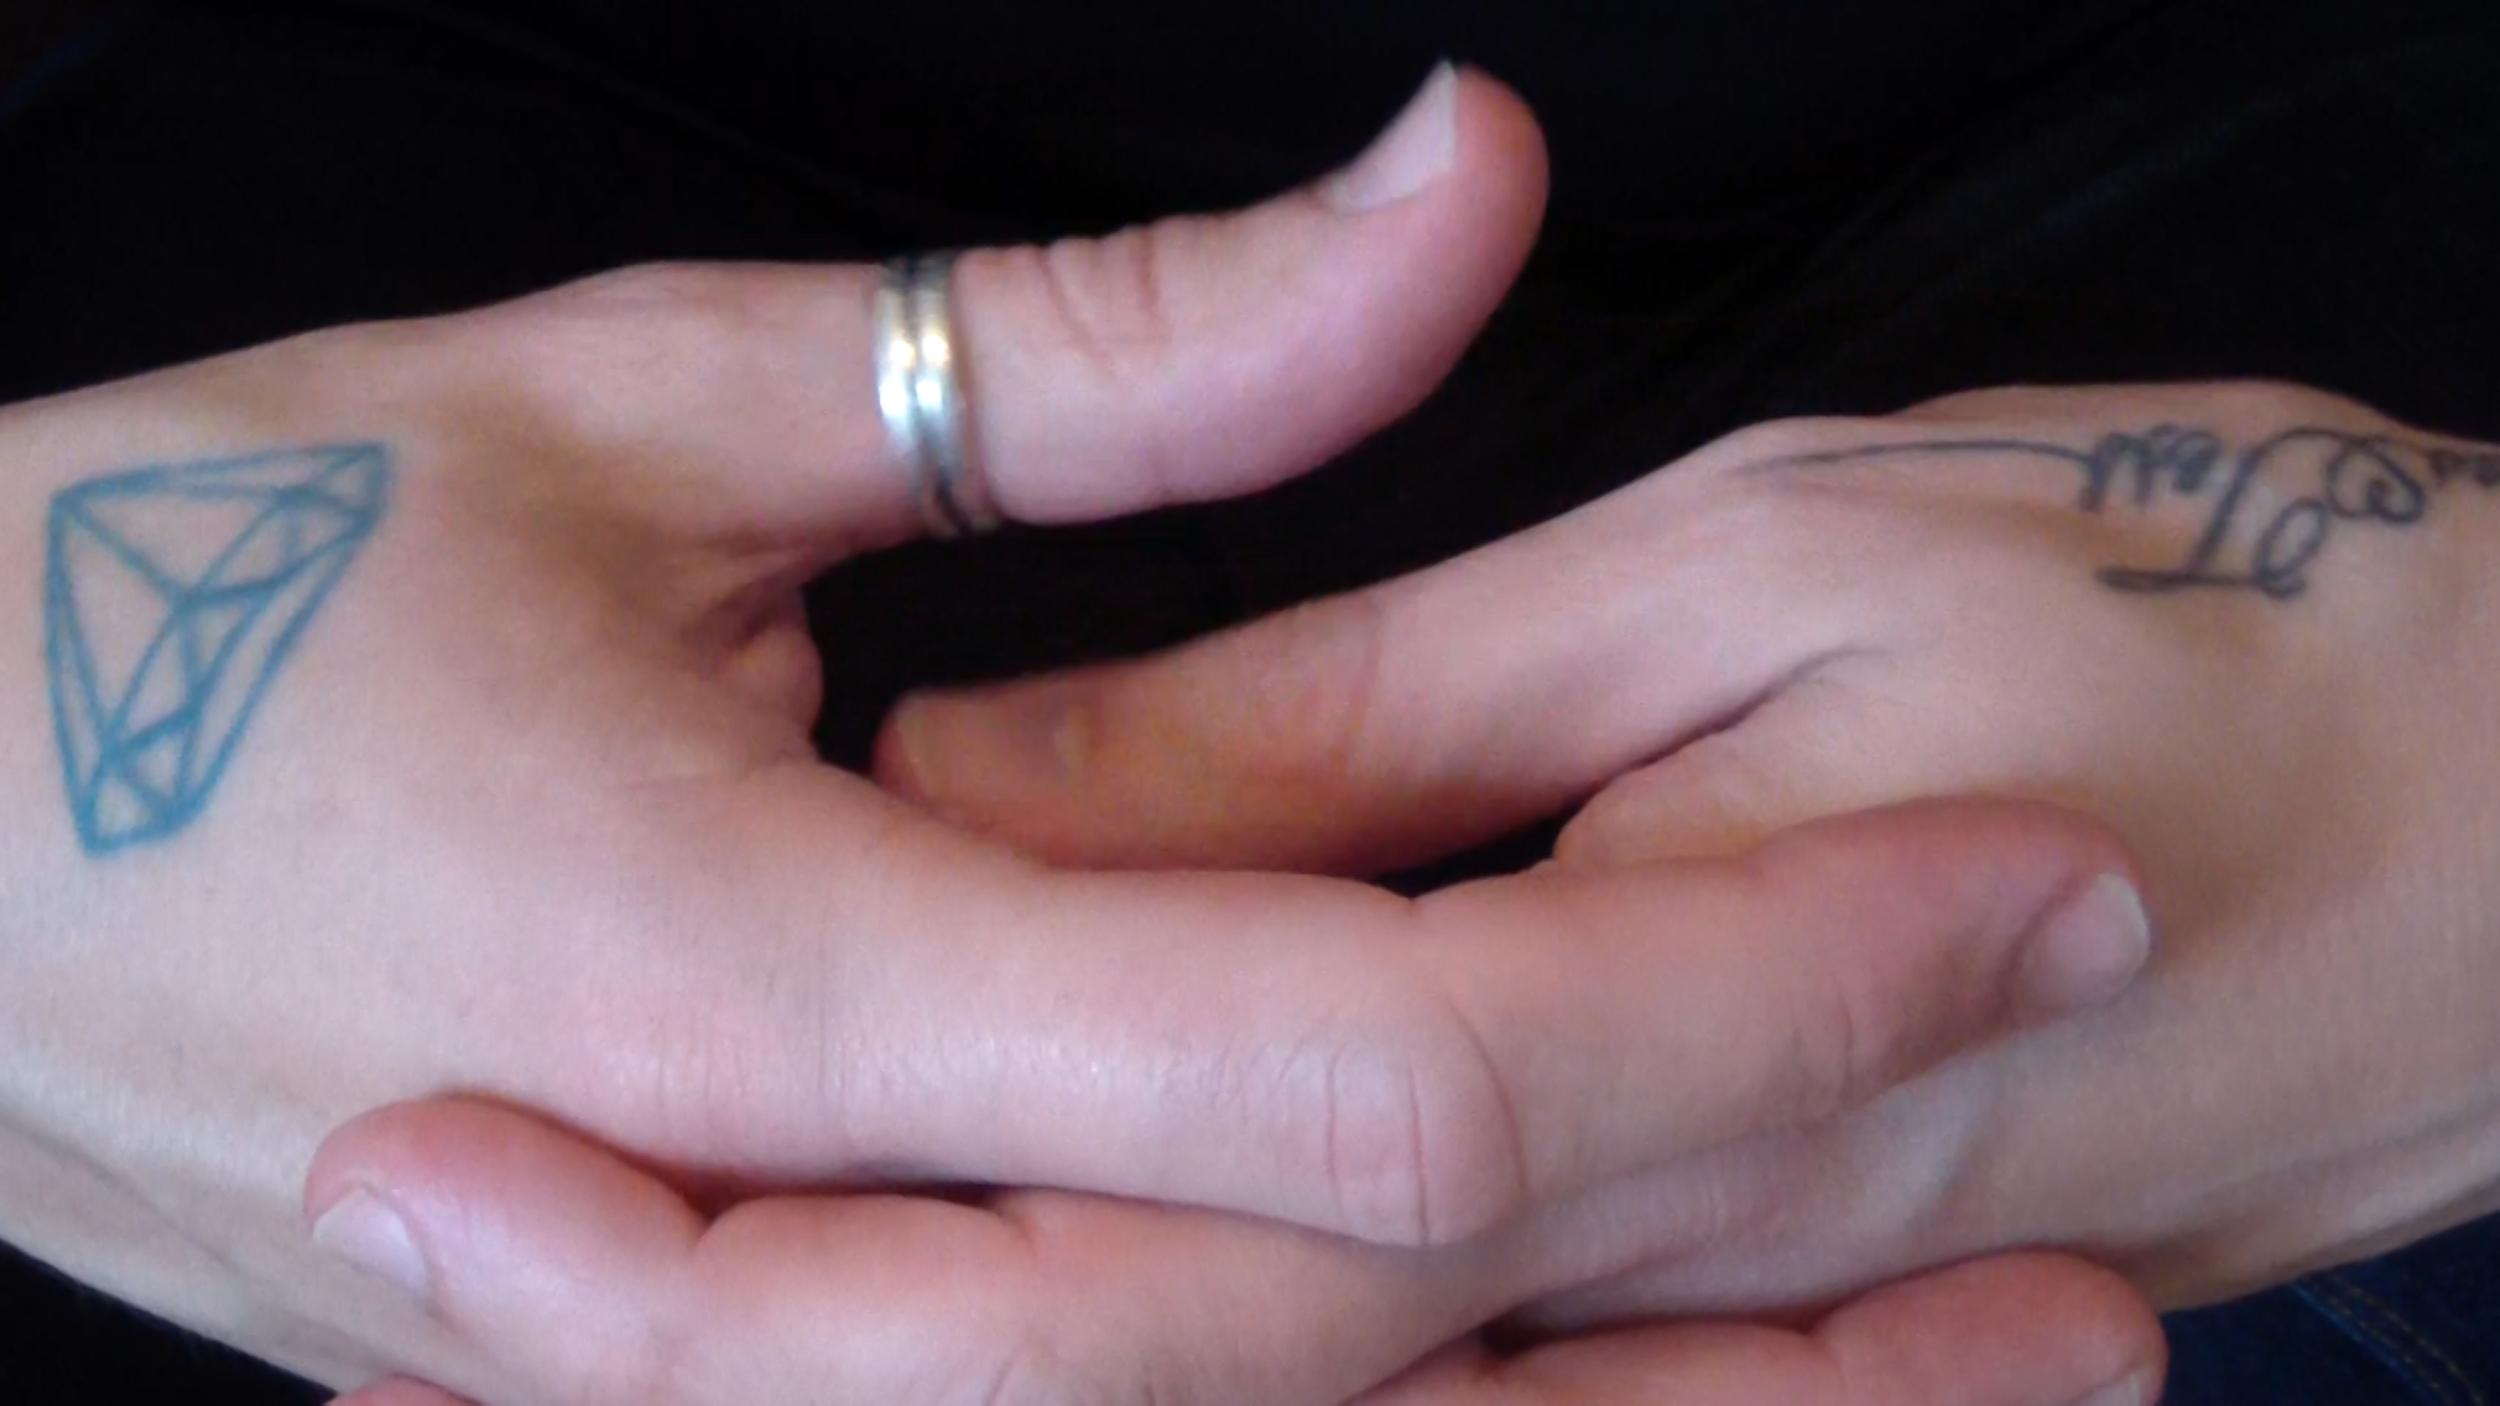 Twiddling My Thumbs (detail)  2014  HD digital video transferred to Blu-ray, silent  1 sec (looped)